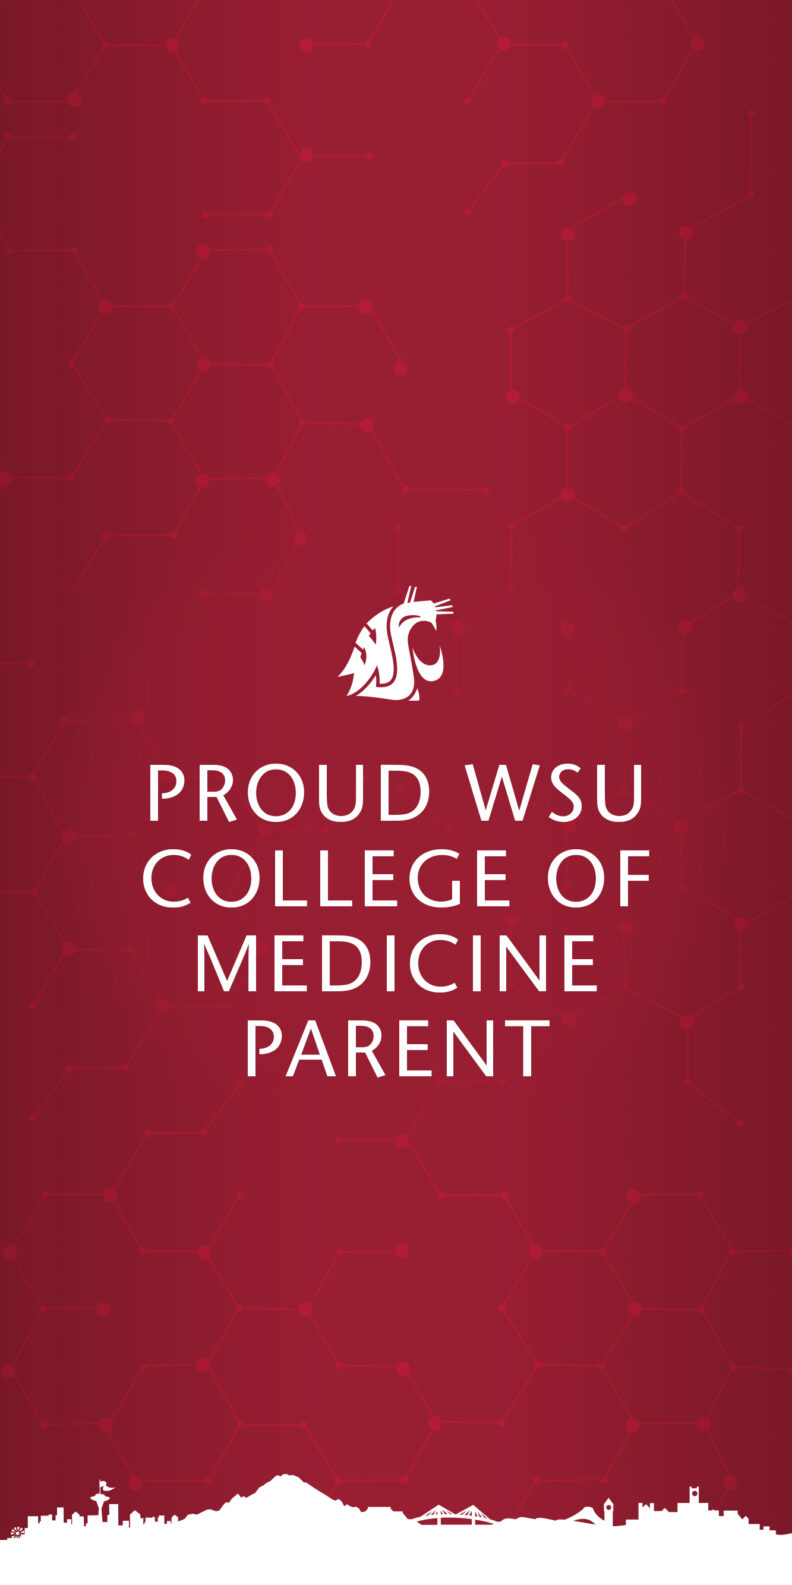 Crimson Vertical Wallpaper Proud WSU College of Medicine PArent